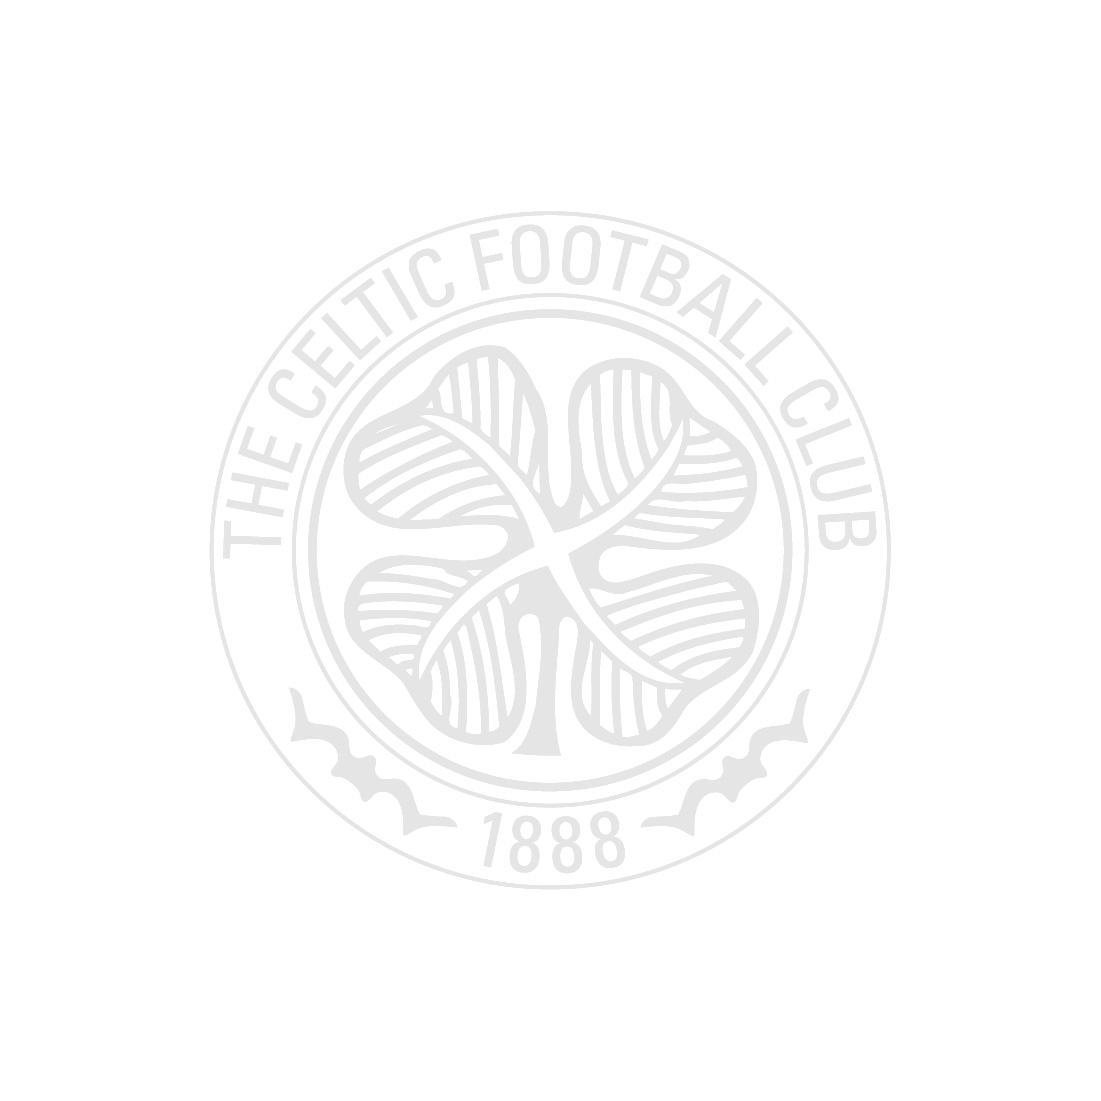 Celtic FC Jelly Beans